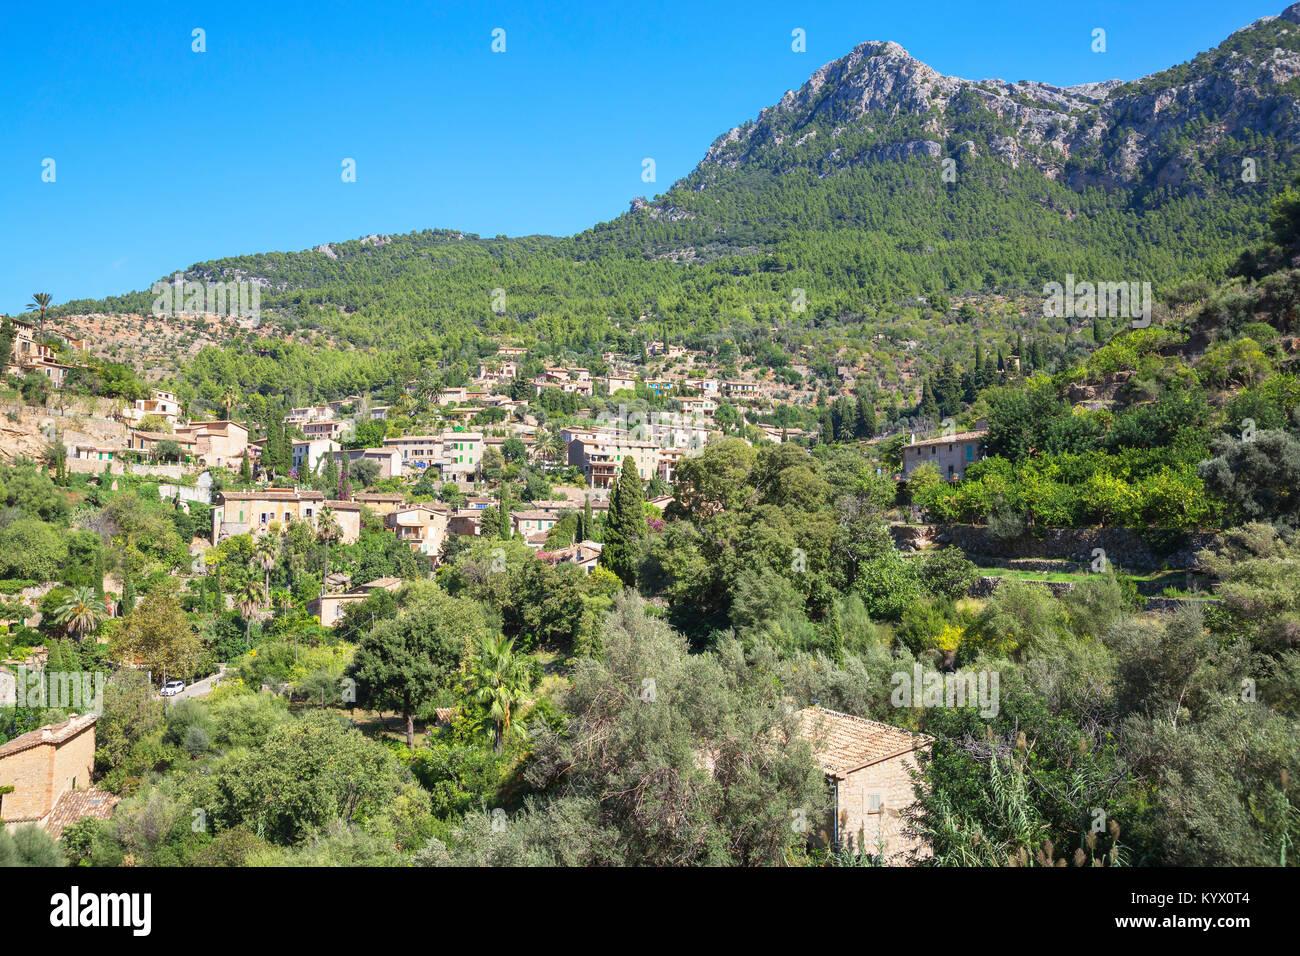 Village de Deia, Deia, Mallorca, Iles Baléares, Espagne, Europe Photo Stock